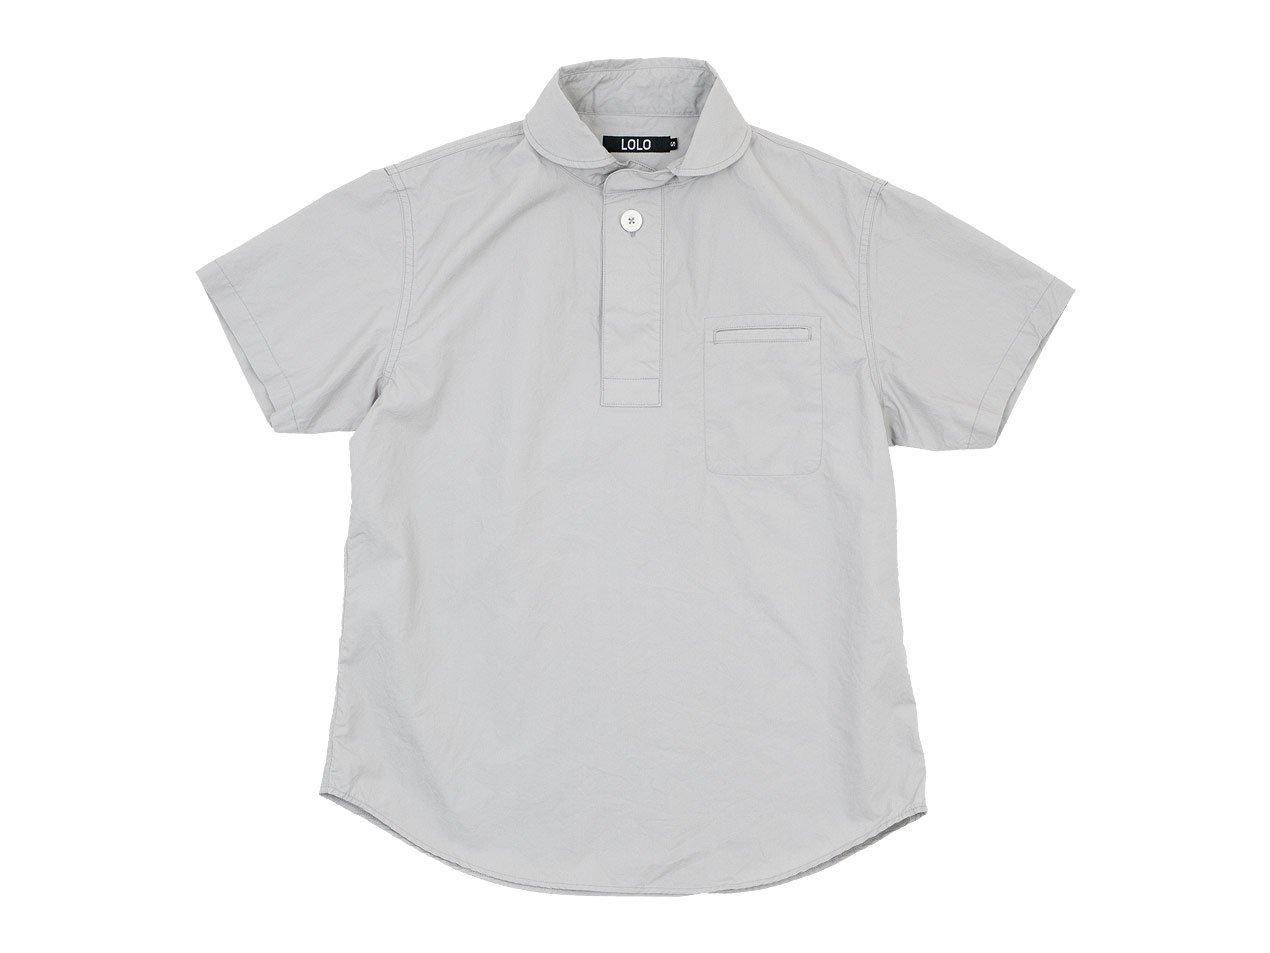 LOLO コットン半袖 プルオーバーシャツ LIGHT GRAY